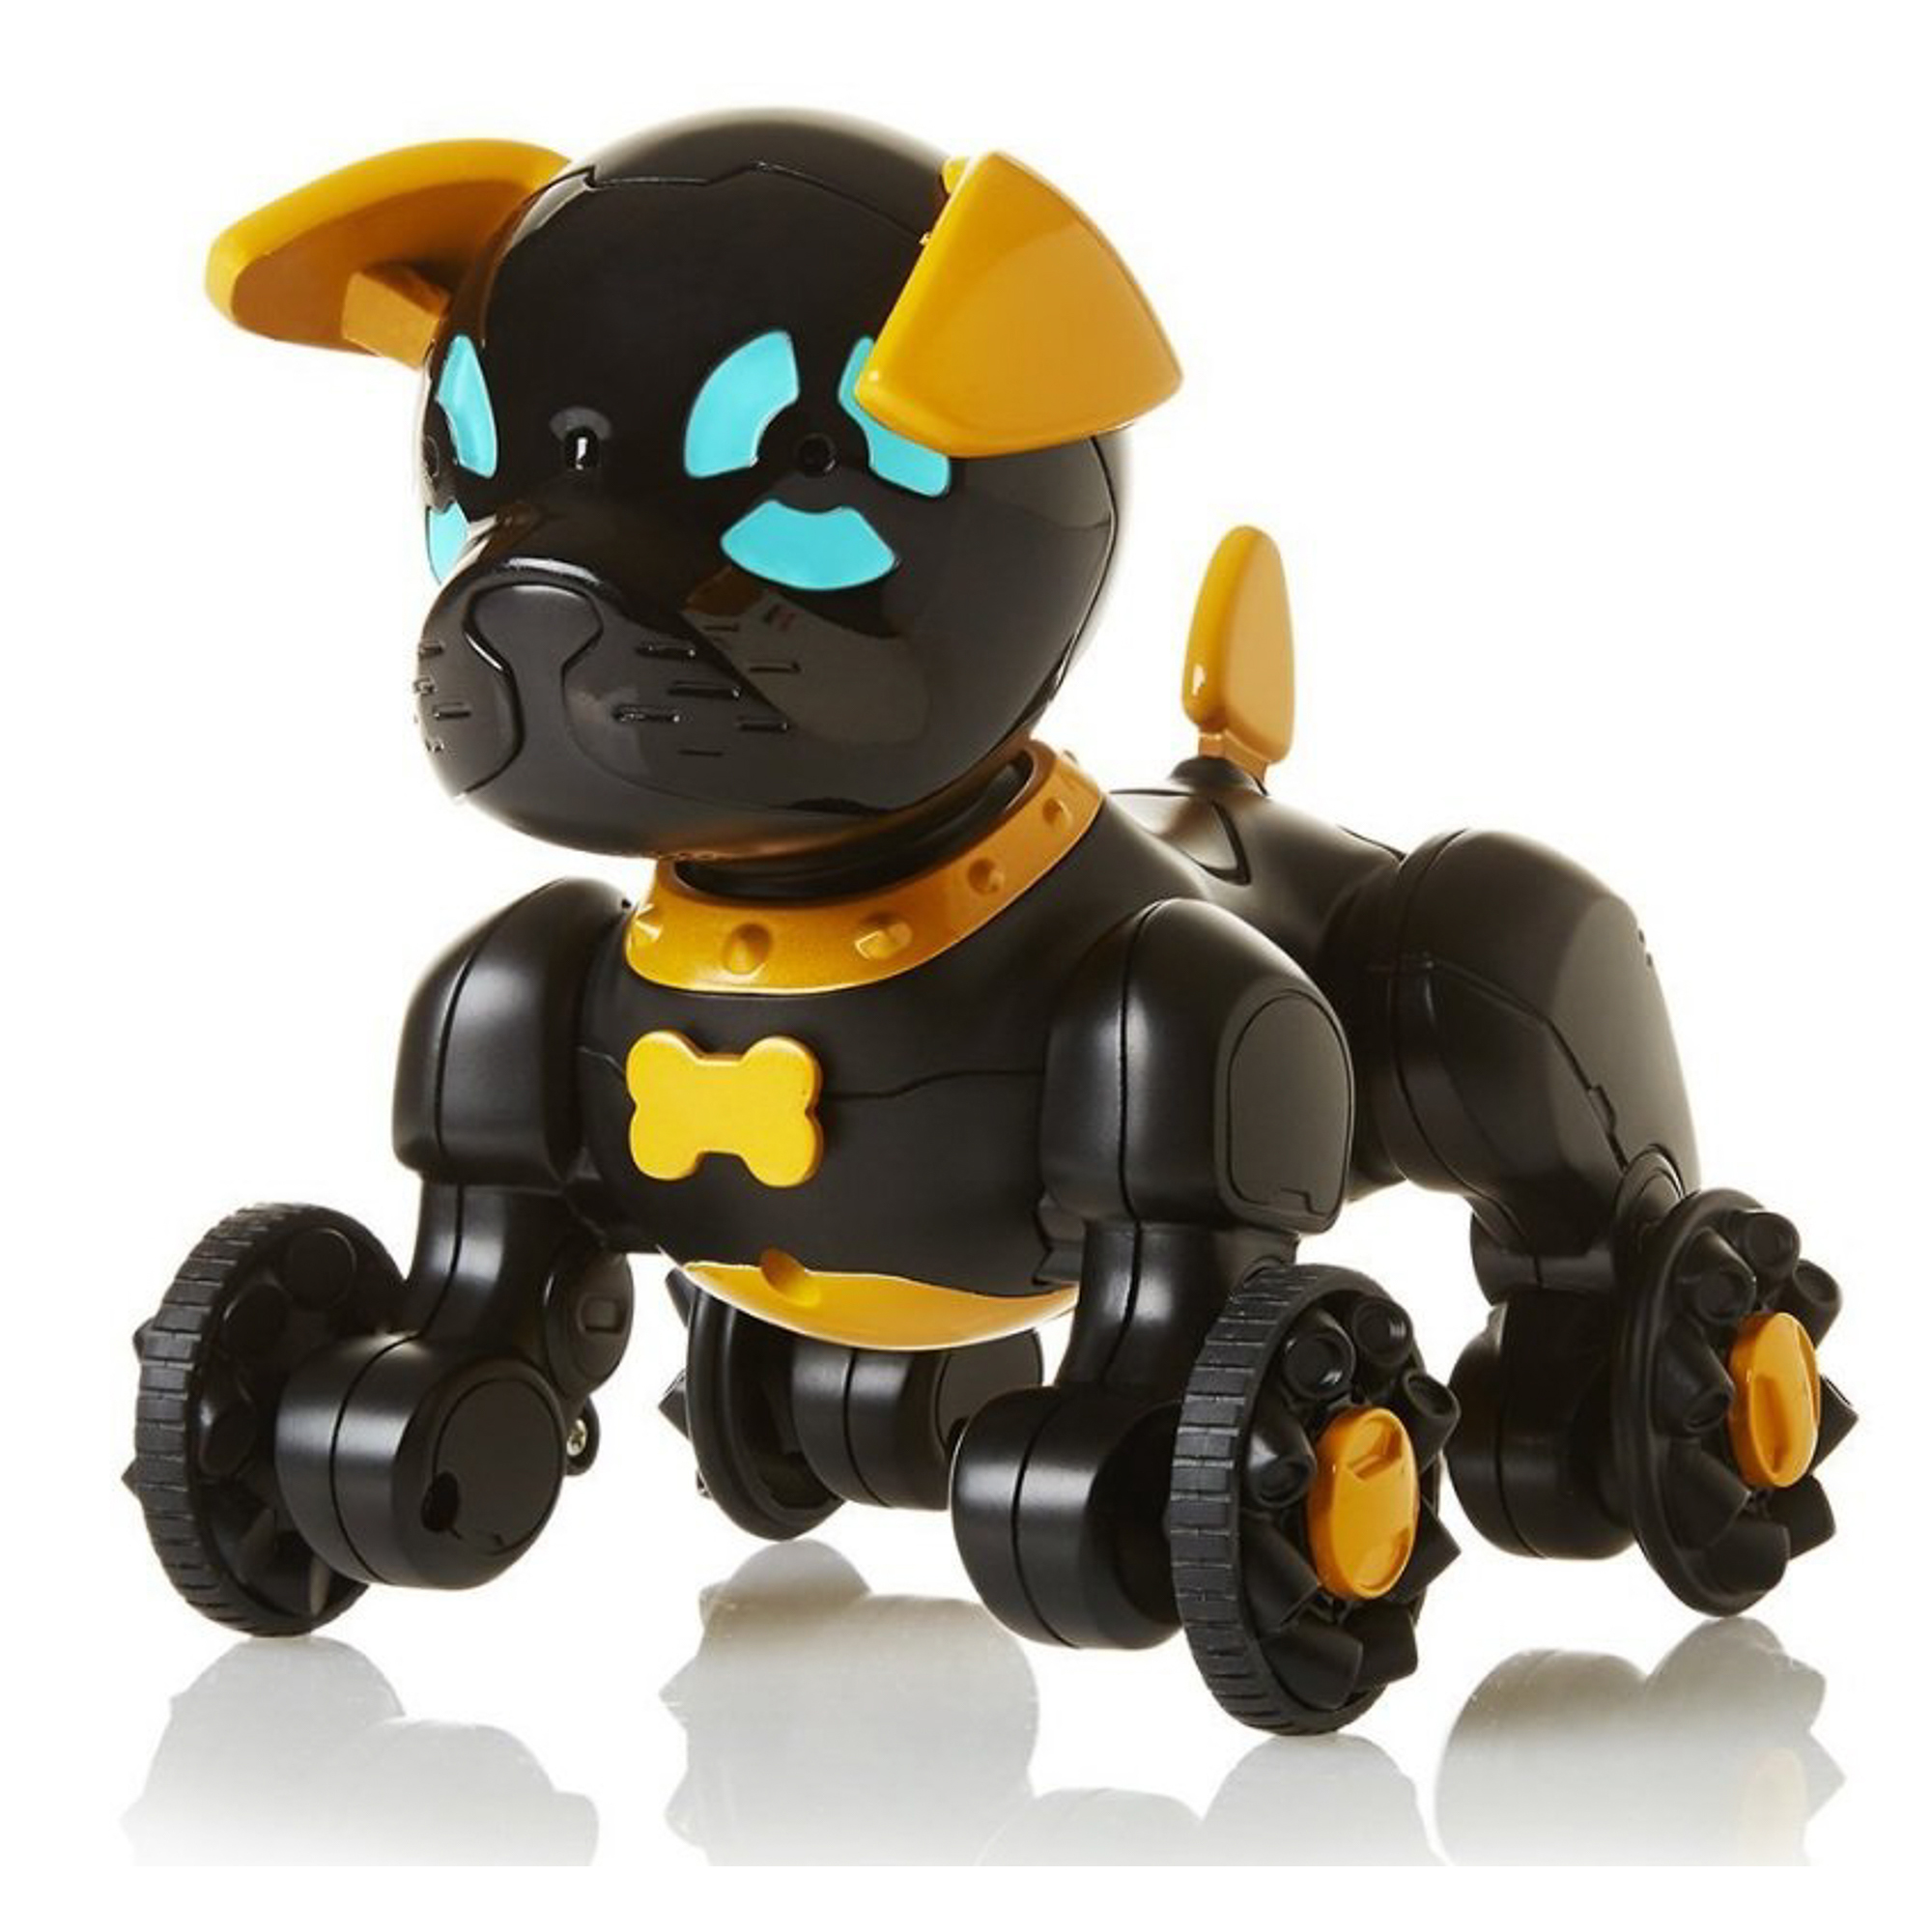 Собачка чиппи черный Wowwee 2804-3819 фото